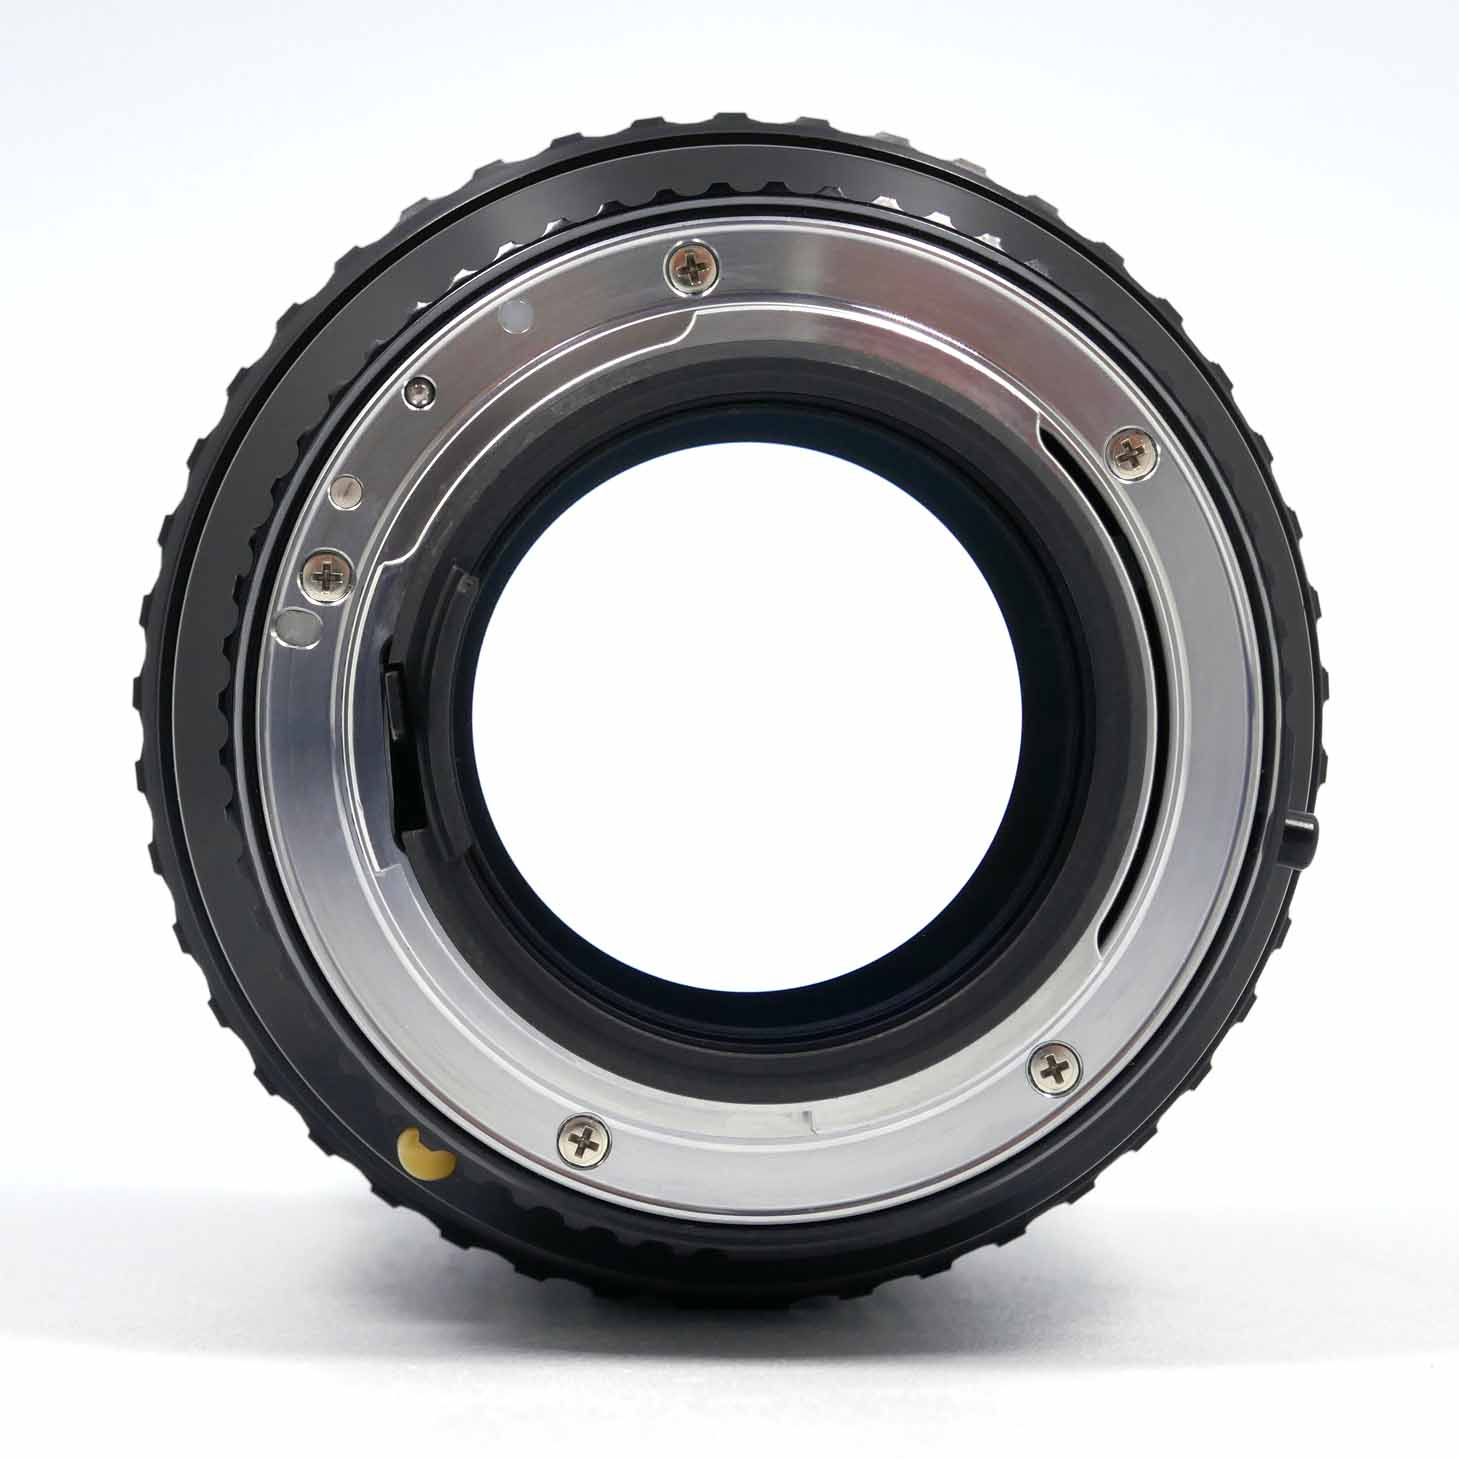 clean-cameras-Pentax-A--SMC-1.8-135mm03